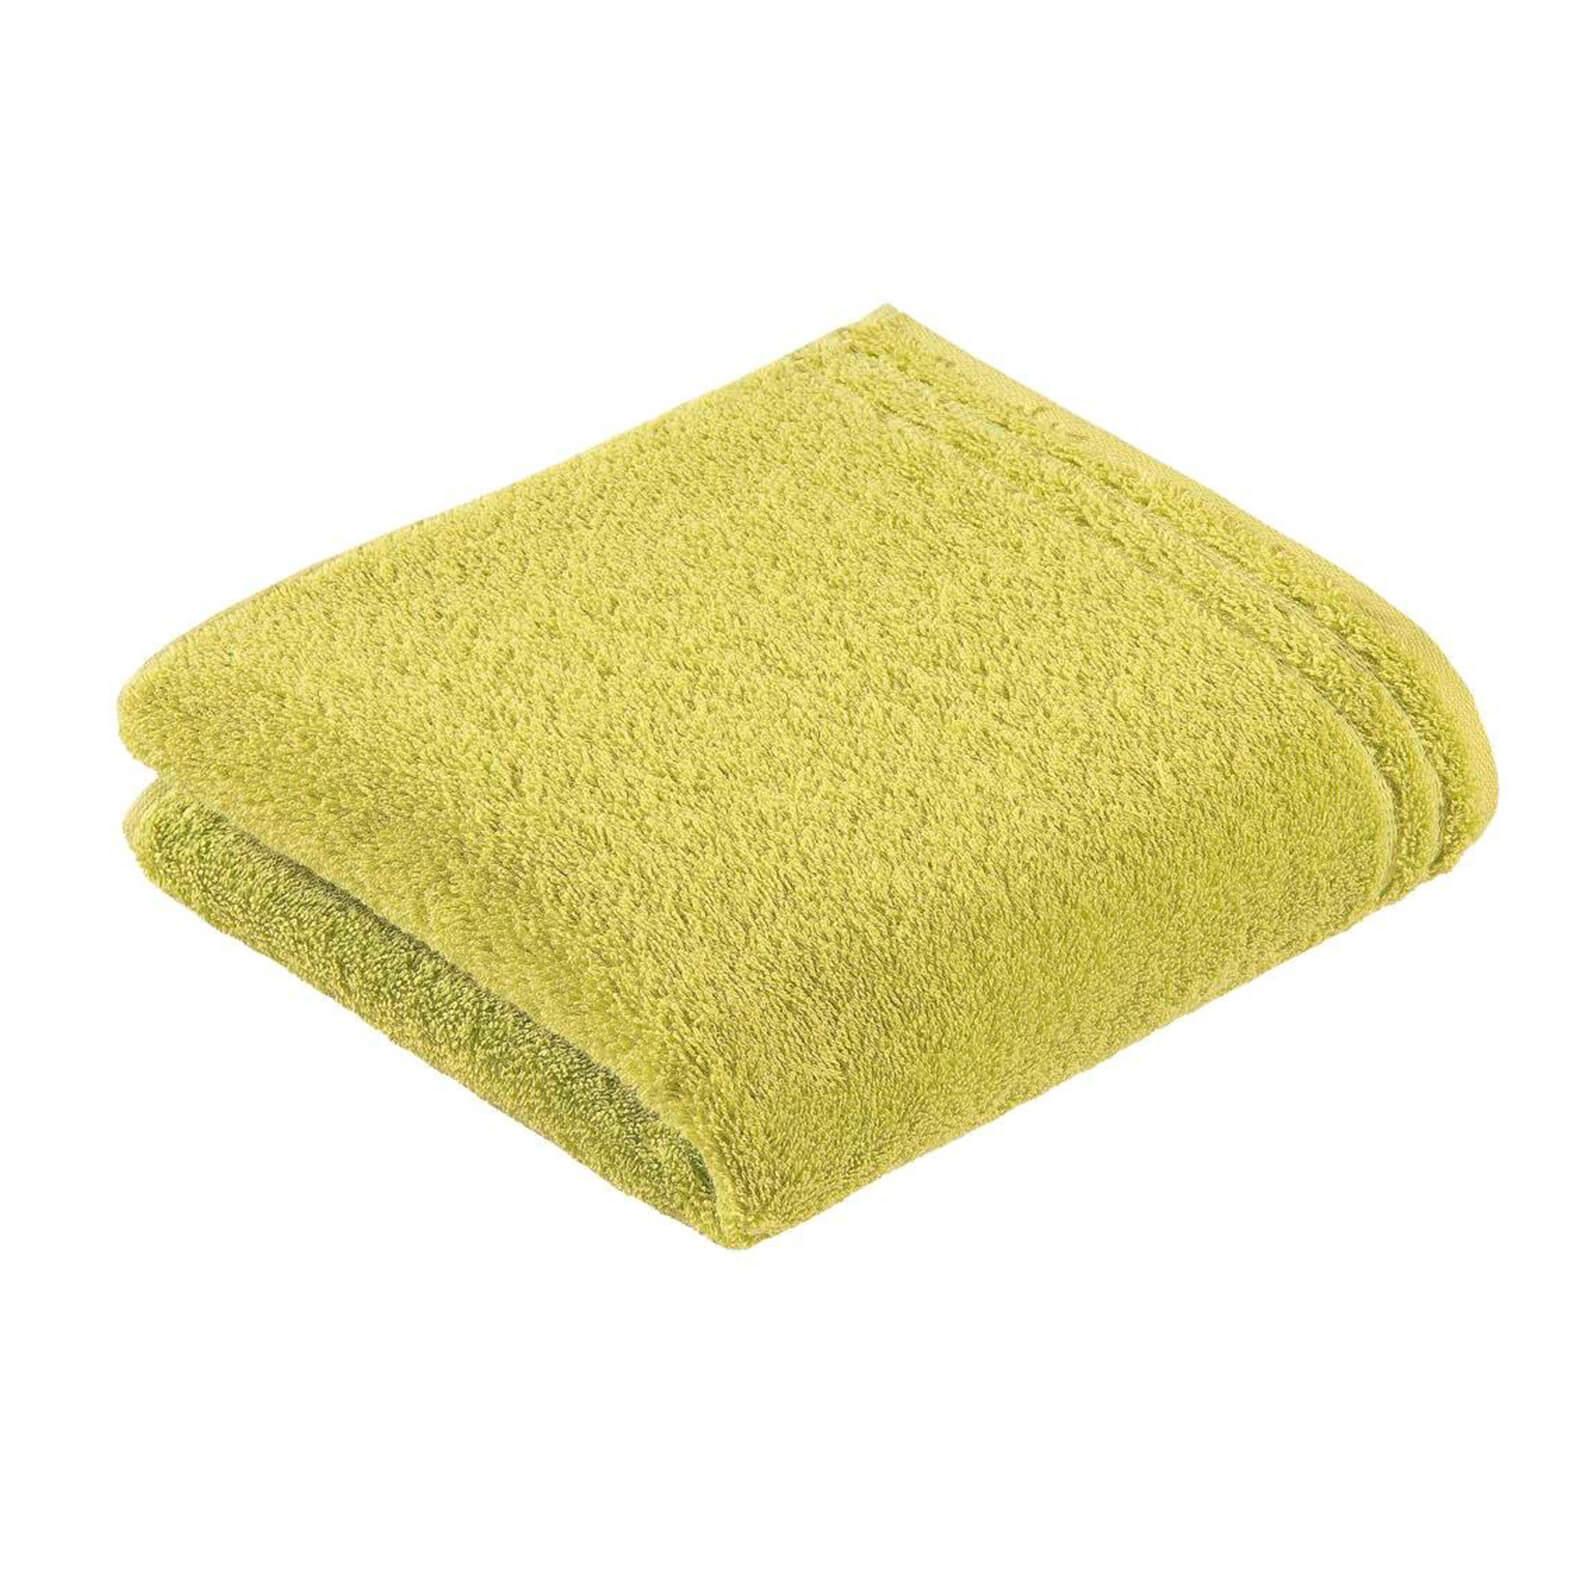 Handtücher bedrucken lassen oder Badetücher besticken bei Saalfrank!